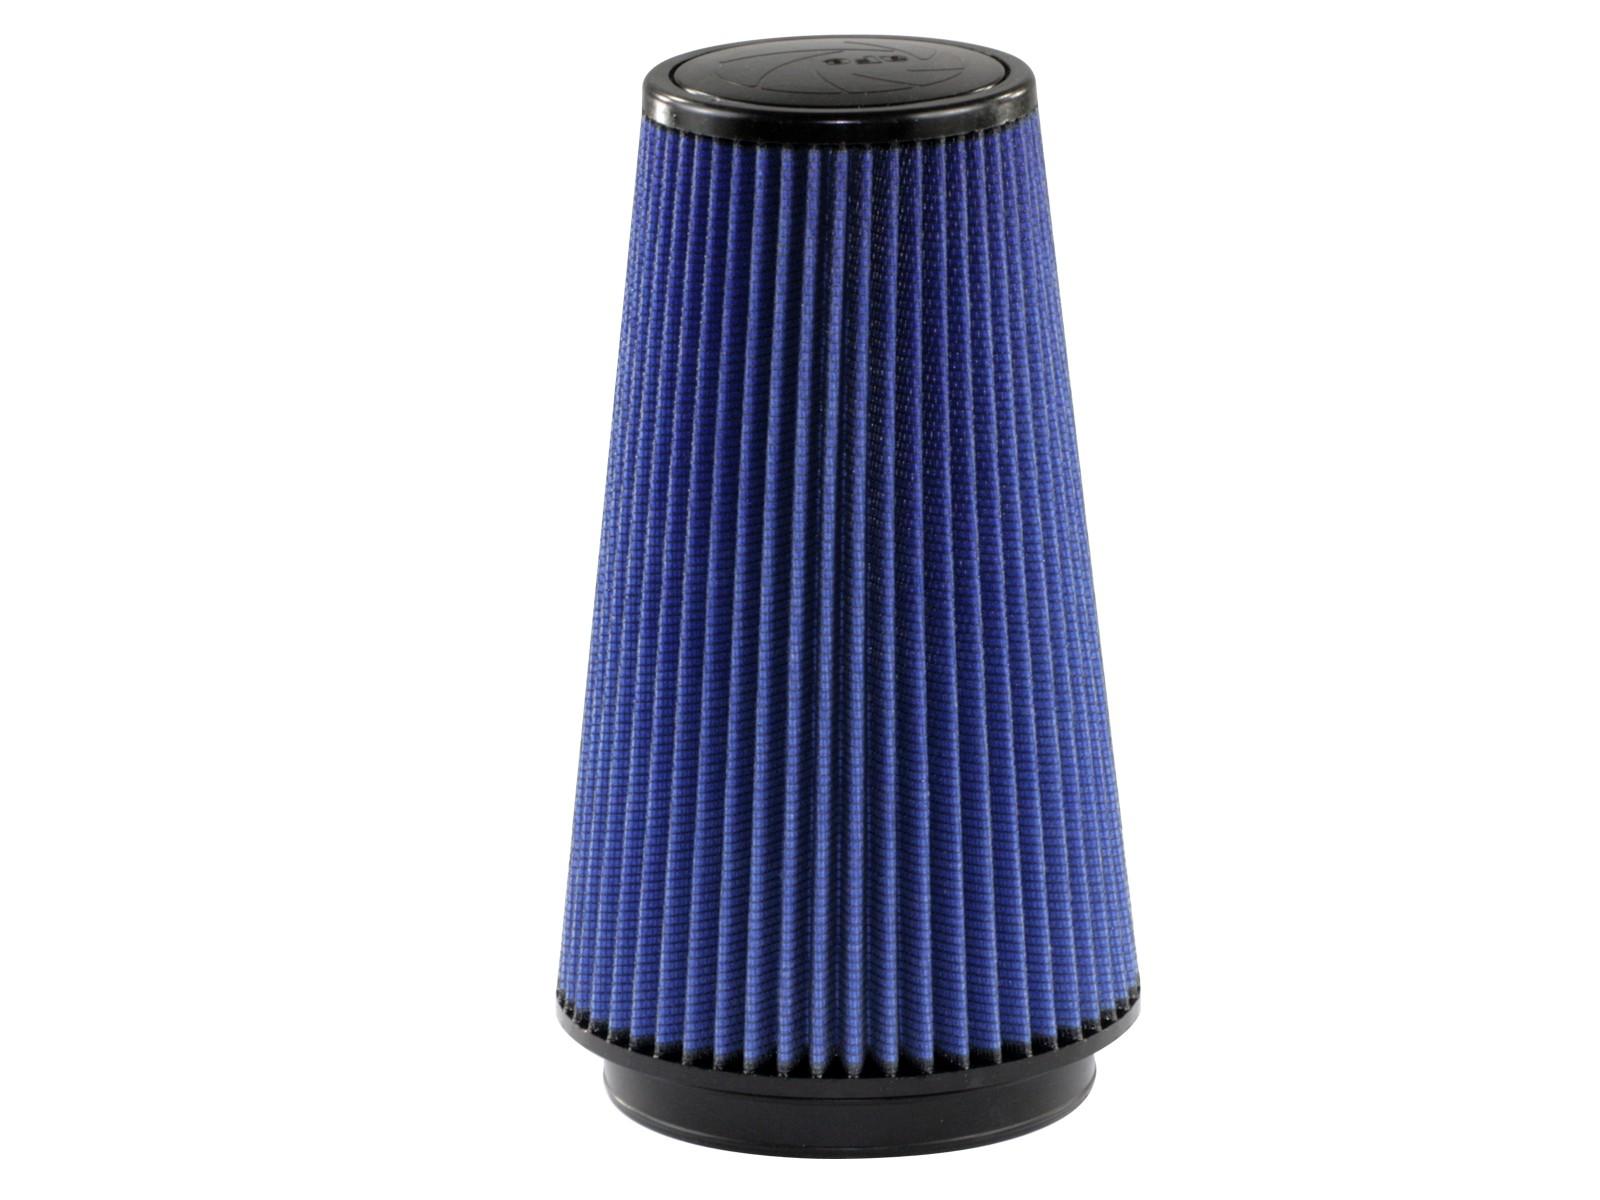 aFe POWER 24-55512 Magnum FLOW Pro 5R Air Filter